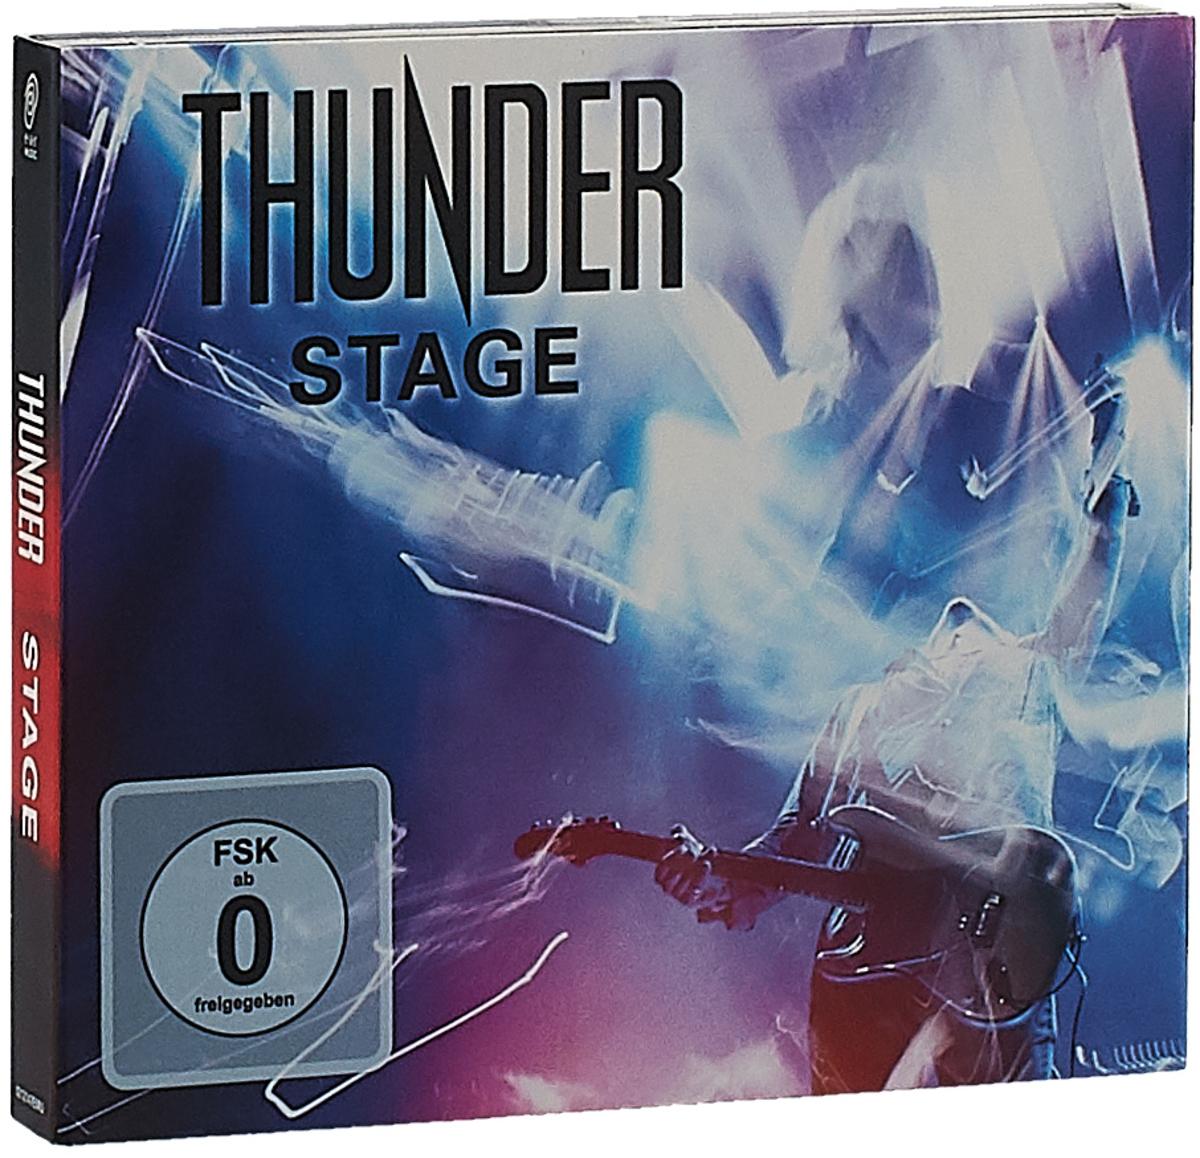 Thunder Thunder. Stage (2 CD + Blu-ray) the beatles 1 2 blu ray cd